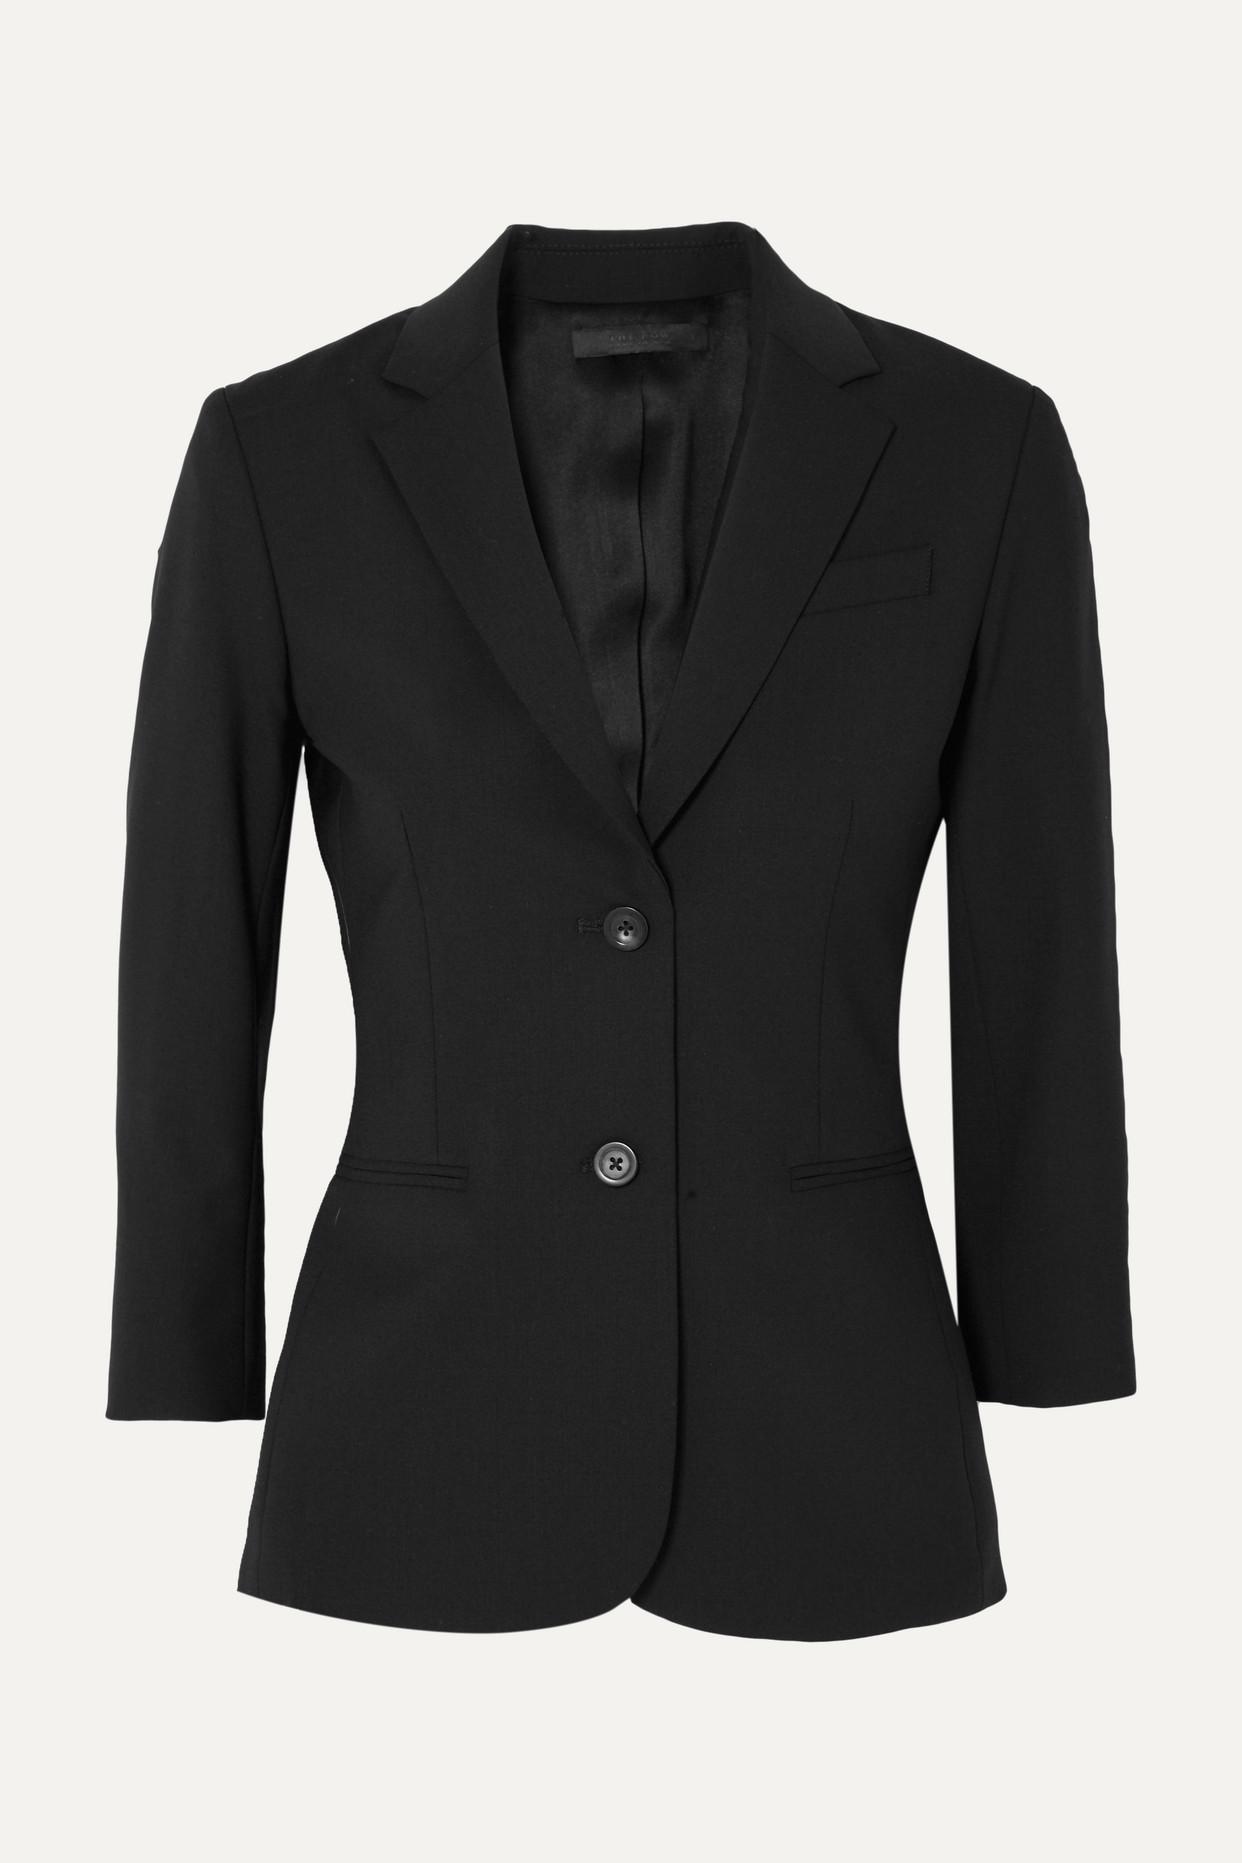 THE ROW - Schoolboy 弹力羊毛混纺绉纱西装式外套 - 黑色 - US8